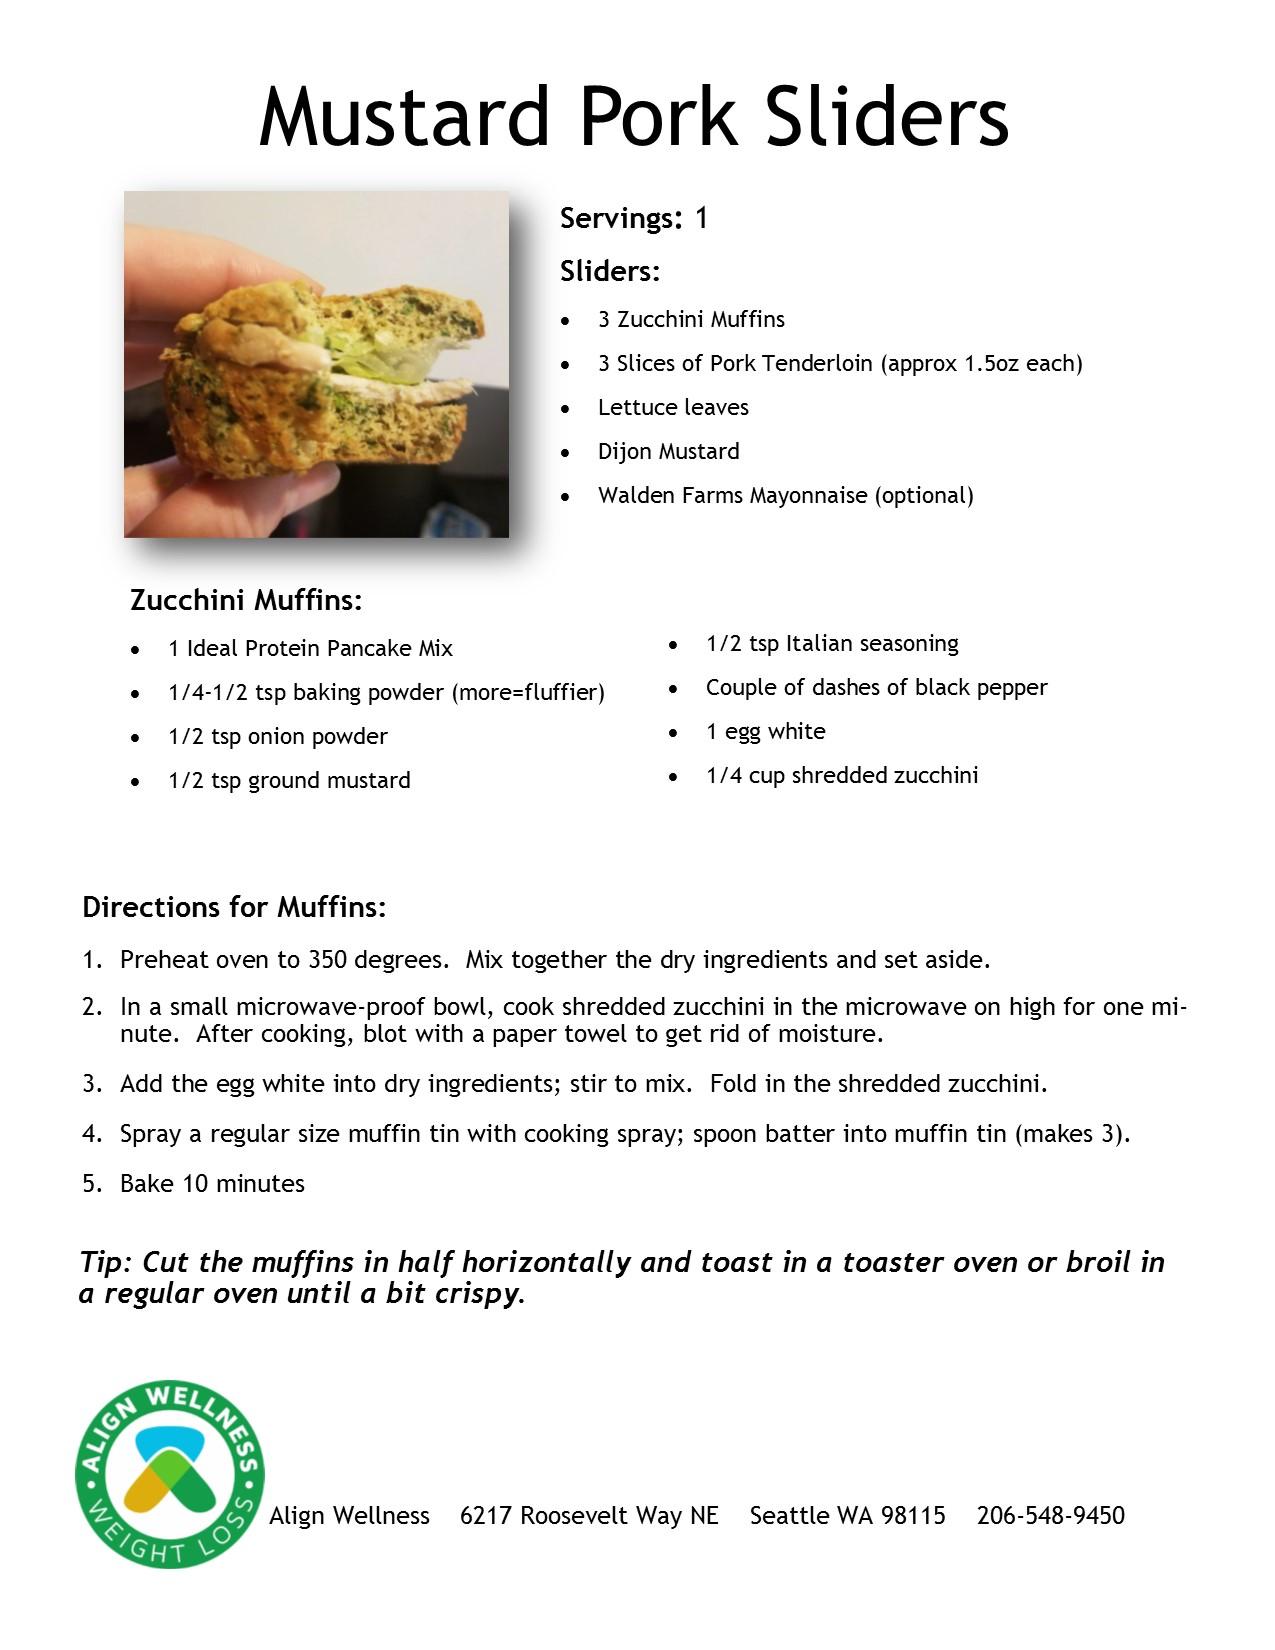 Mustard Pork Sliders Ideal Protein Recipe